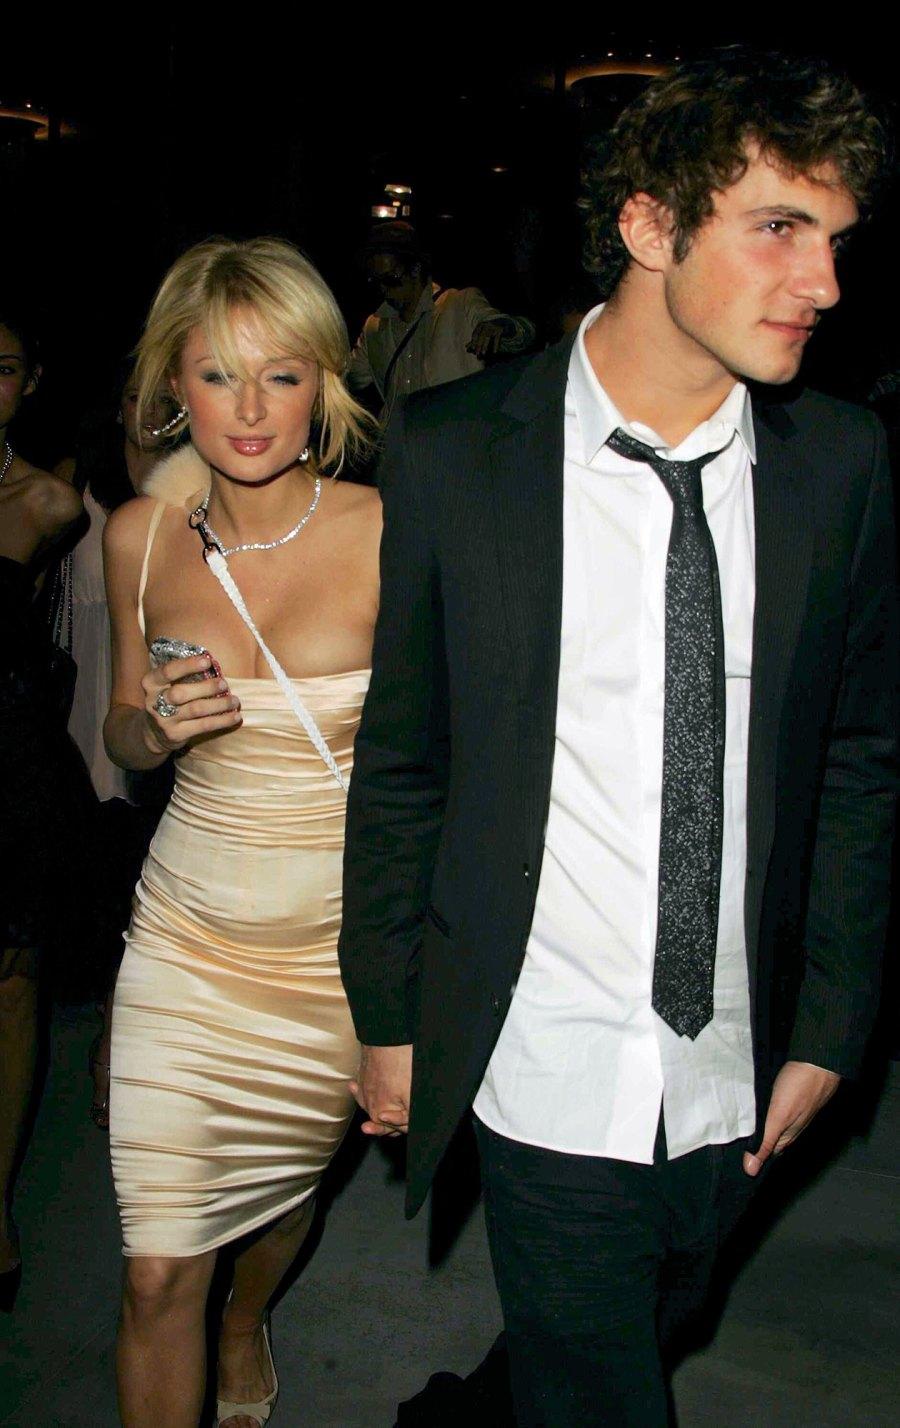 Stavros Niarchos Paris Hilton Complete Dating History